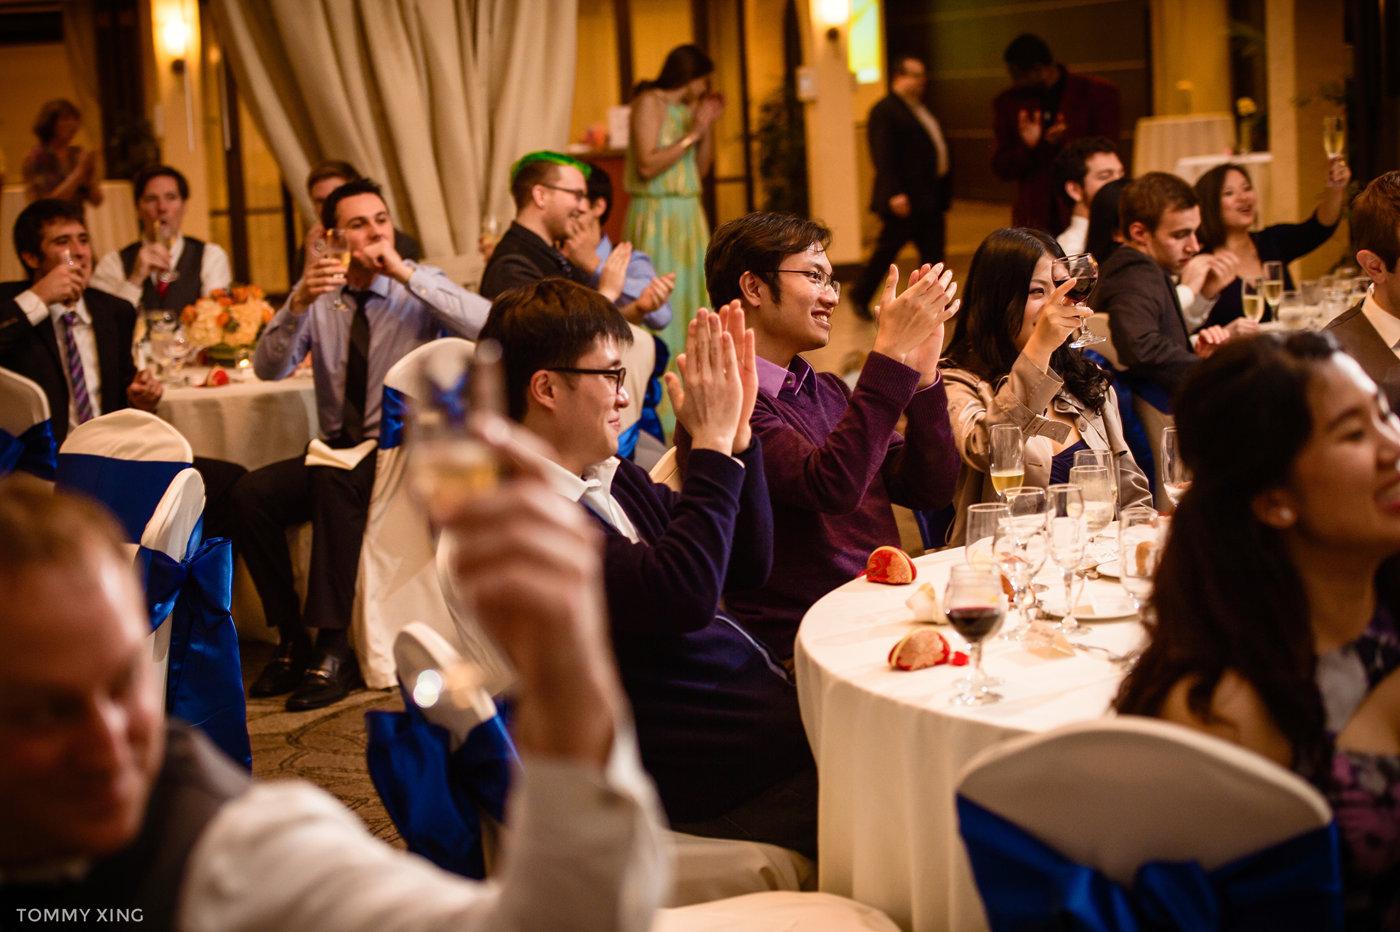 STANFORD MEMORIAL CHURCH WEDDING - Wenjie & Chengcheng - SAN FRANCISCO BAY AREA 斯坦福教堂婚礼跟拍 - 洛杉矶婚礼婚纱照摄影师 Tommy Xing Photography193.jpg